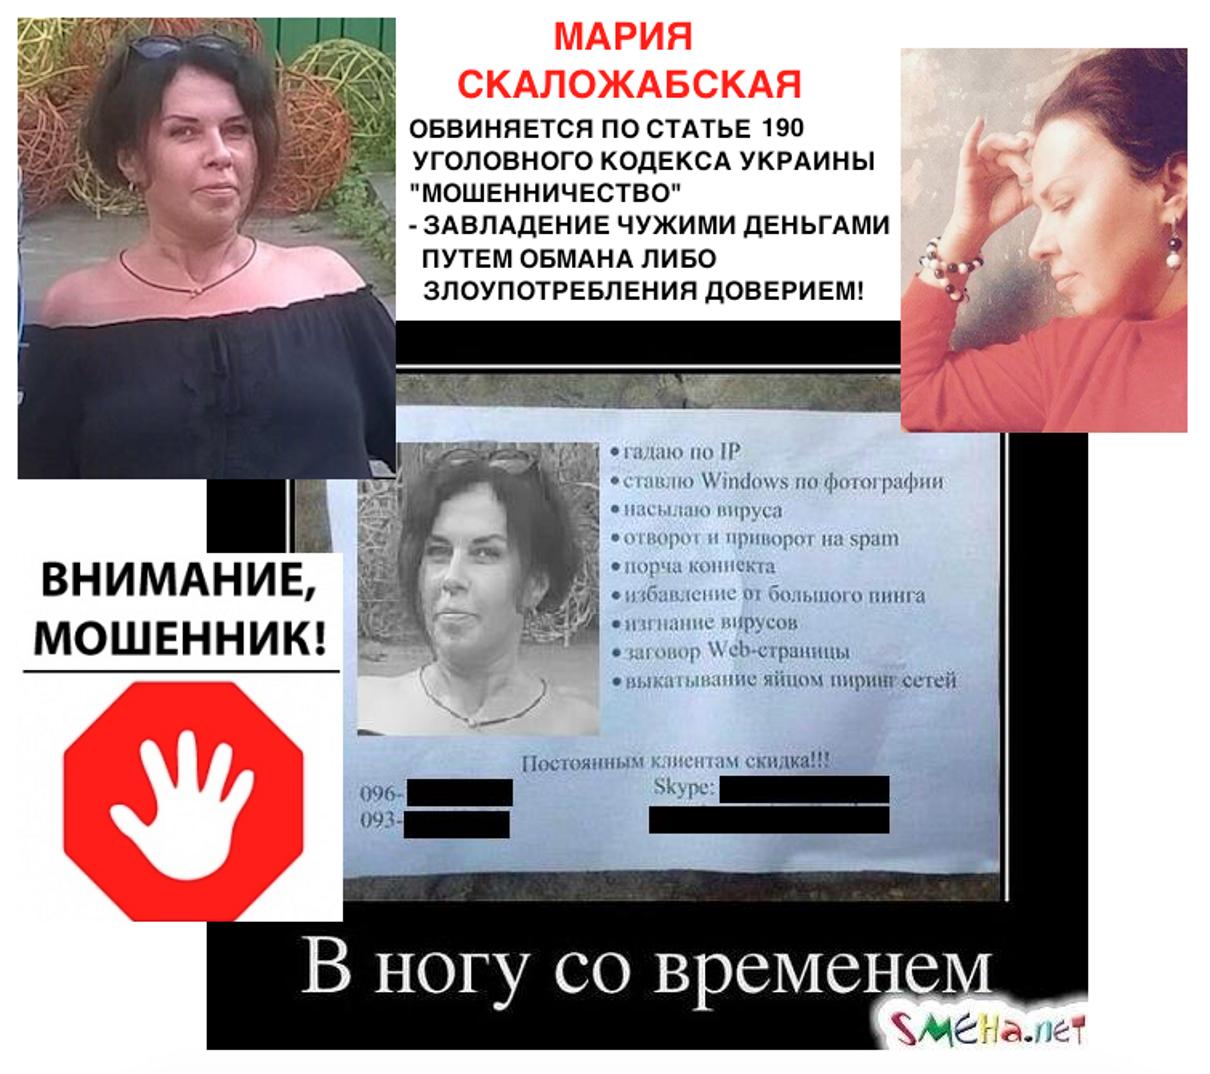 Жалоба-отзыв: Мария Скаложабская - Мария Скаложабская мошенница.  Фото №1